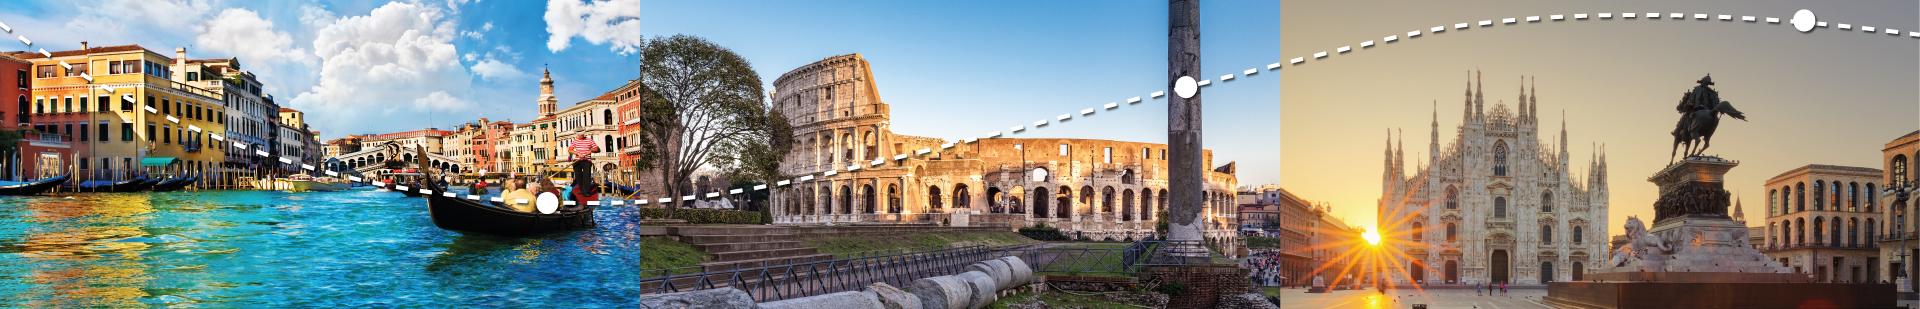 Tours en Italia